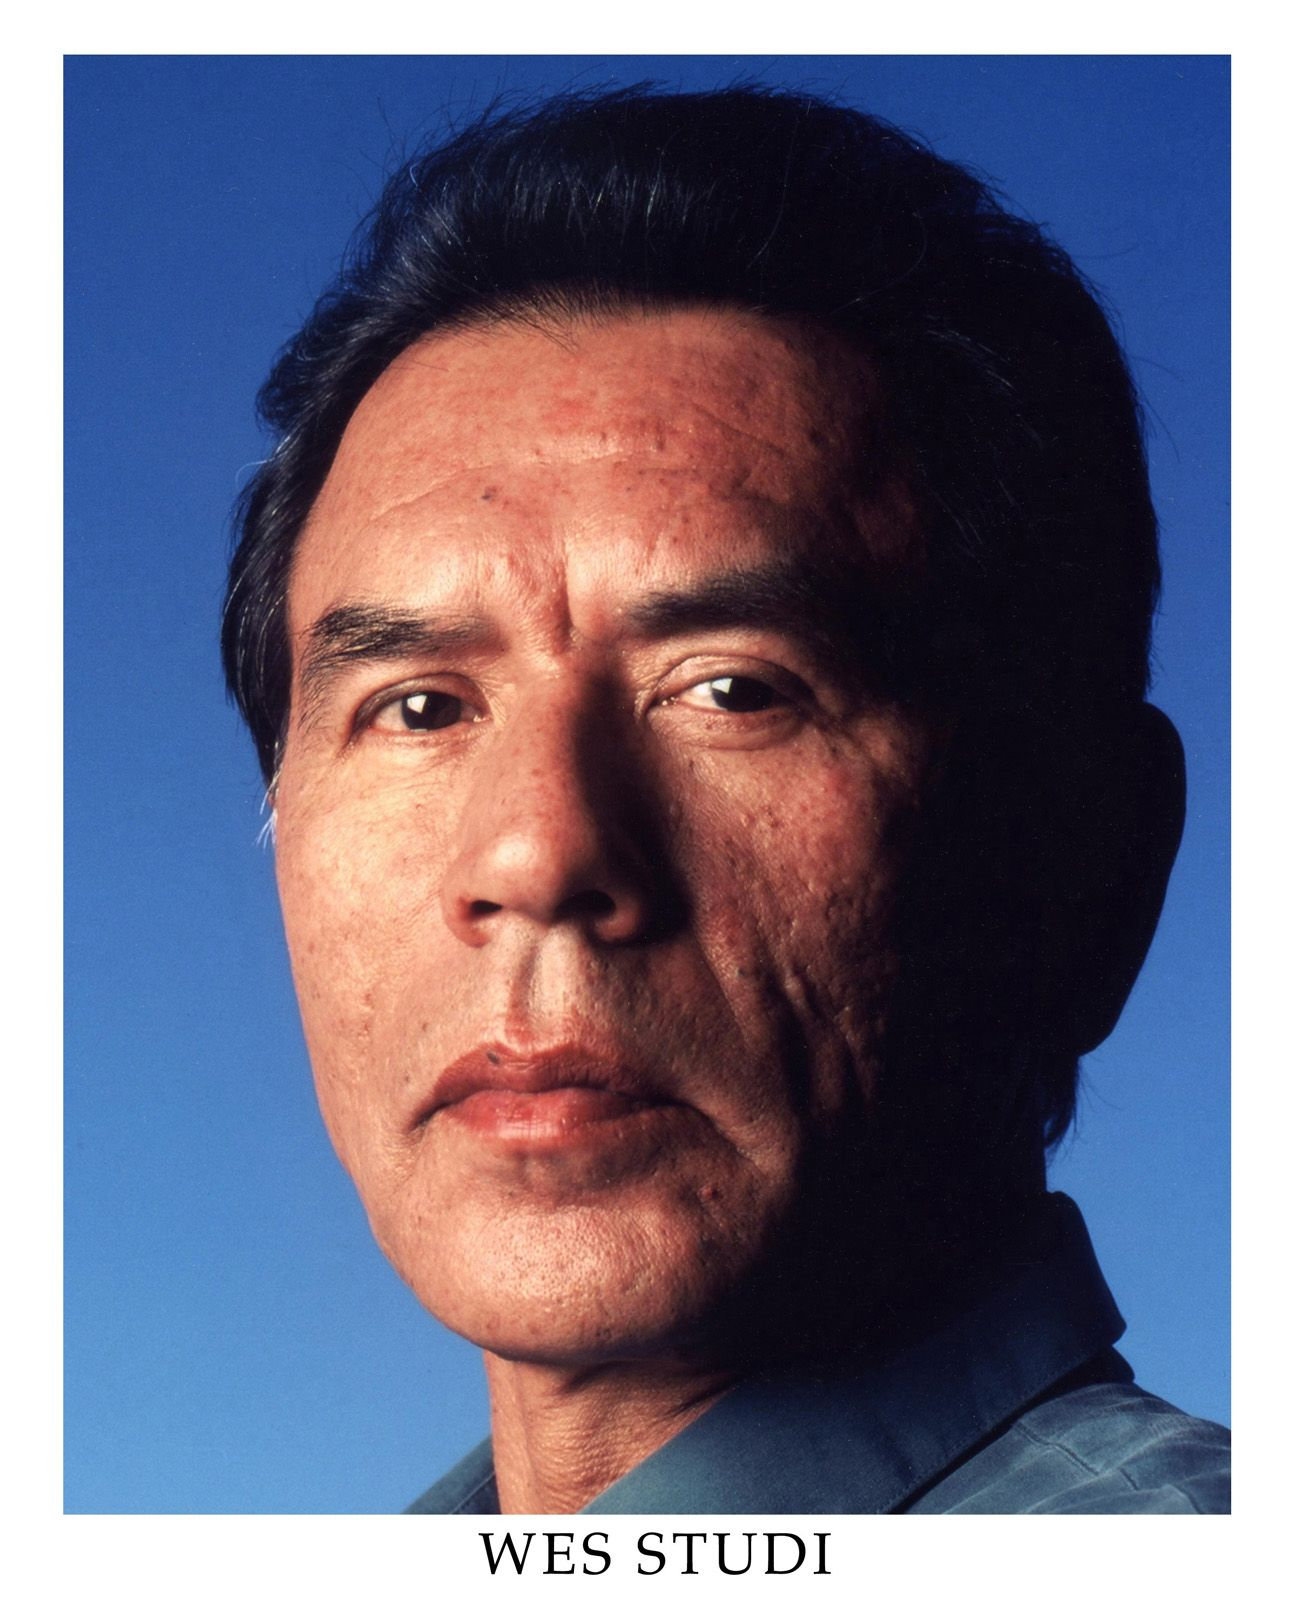 Cherokee Indian Wes Studi film maker